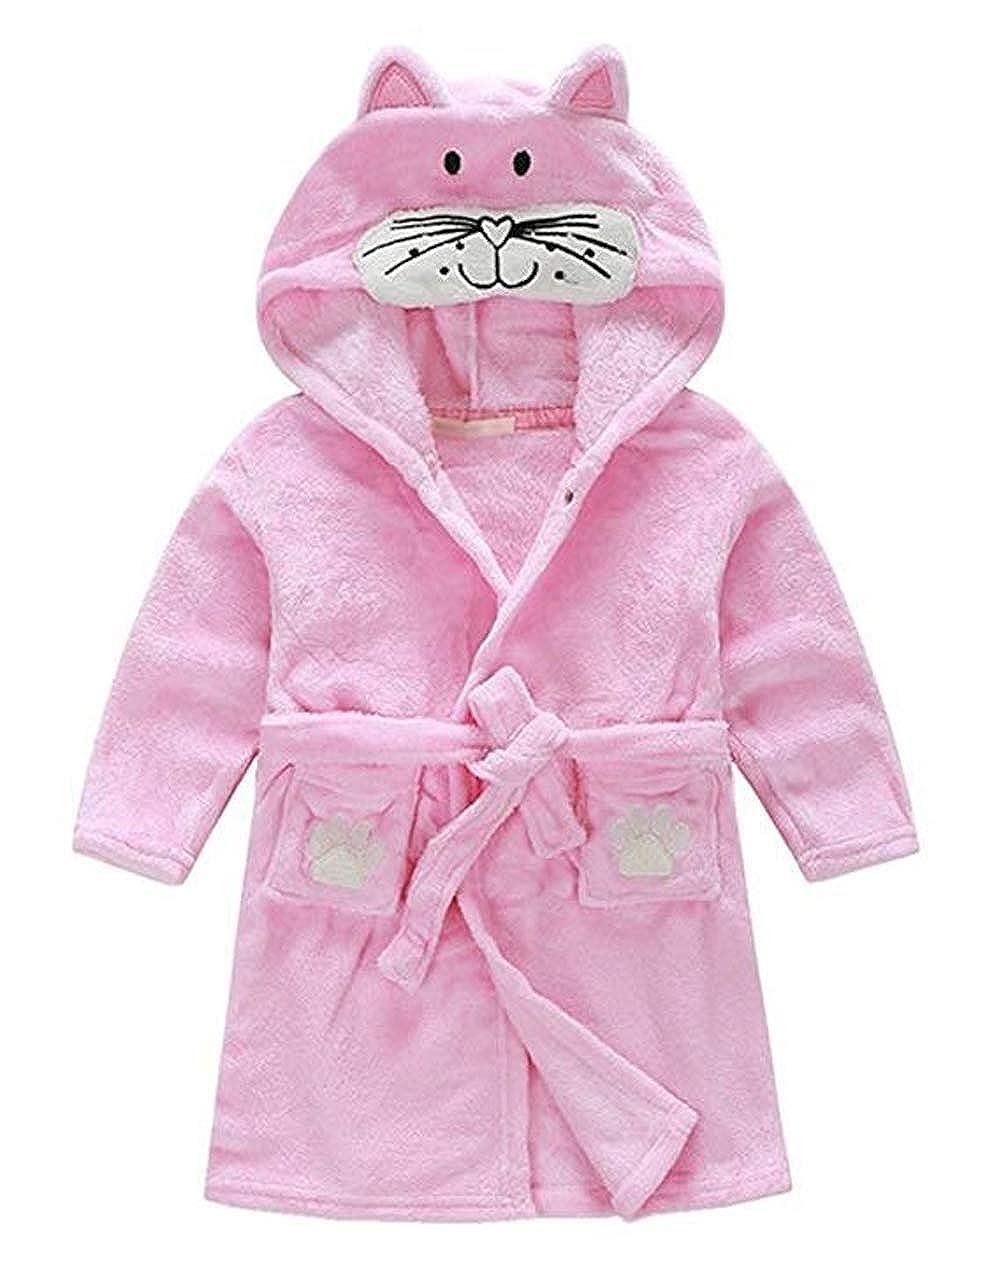 dba19d4d9d Amazon.com  Little Boys Girls Bathrobes,Toddler Kids Cartoon Hooded Plush  Robe,Animal Pajamas Fleece Bathrobe for Kids  Clothing